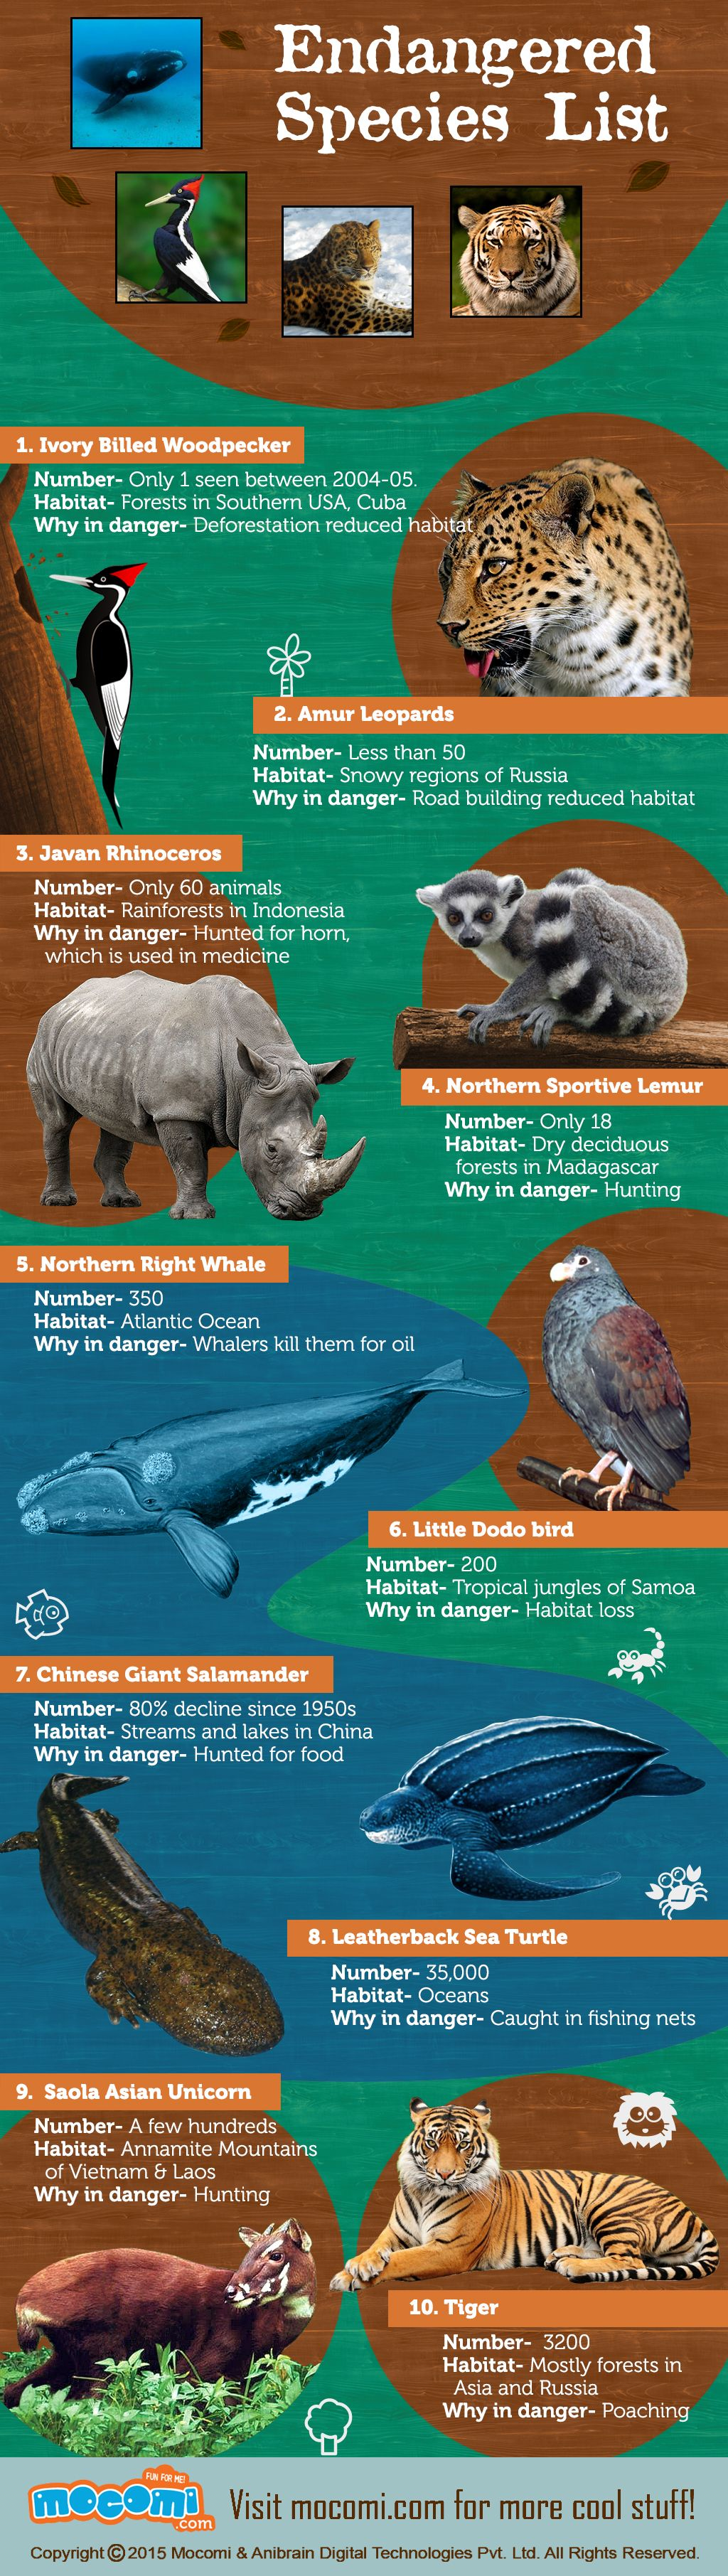 World's Top 10 Endangered Species General Knowledge